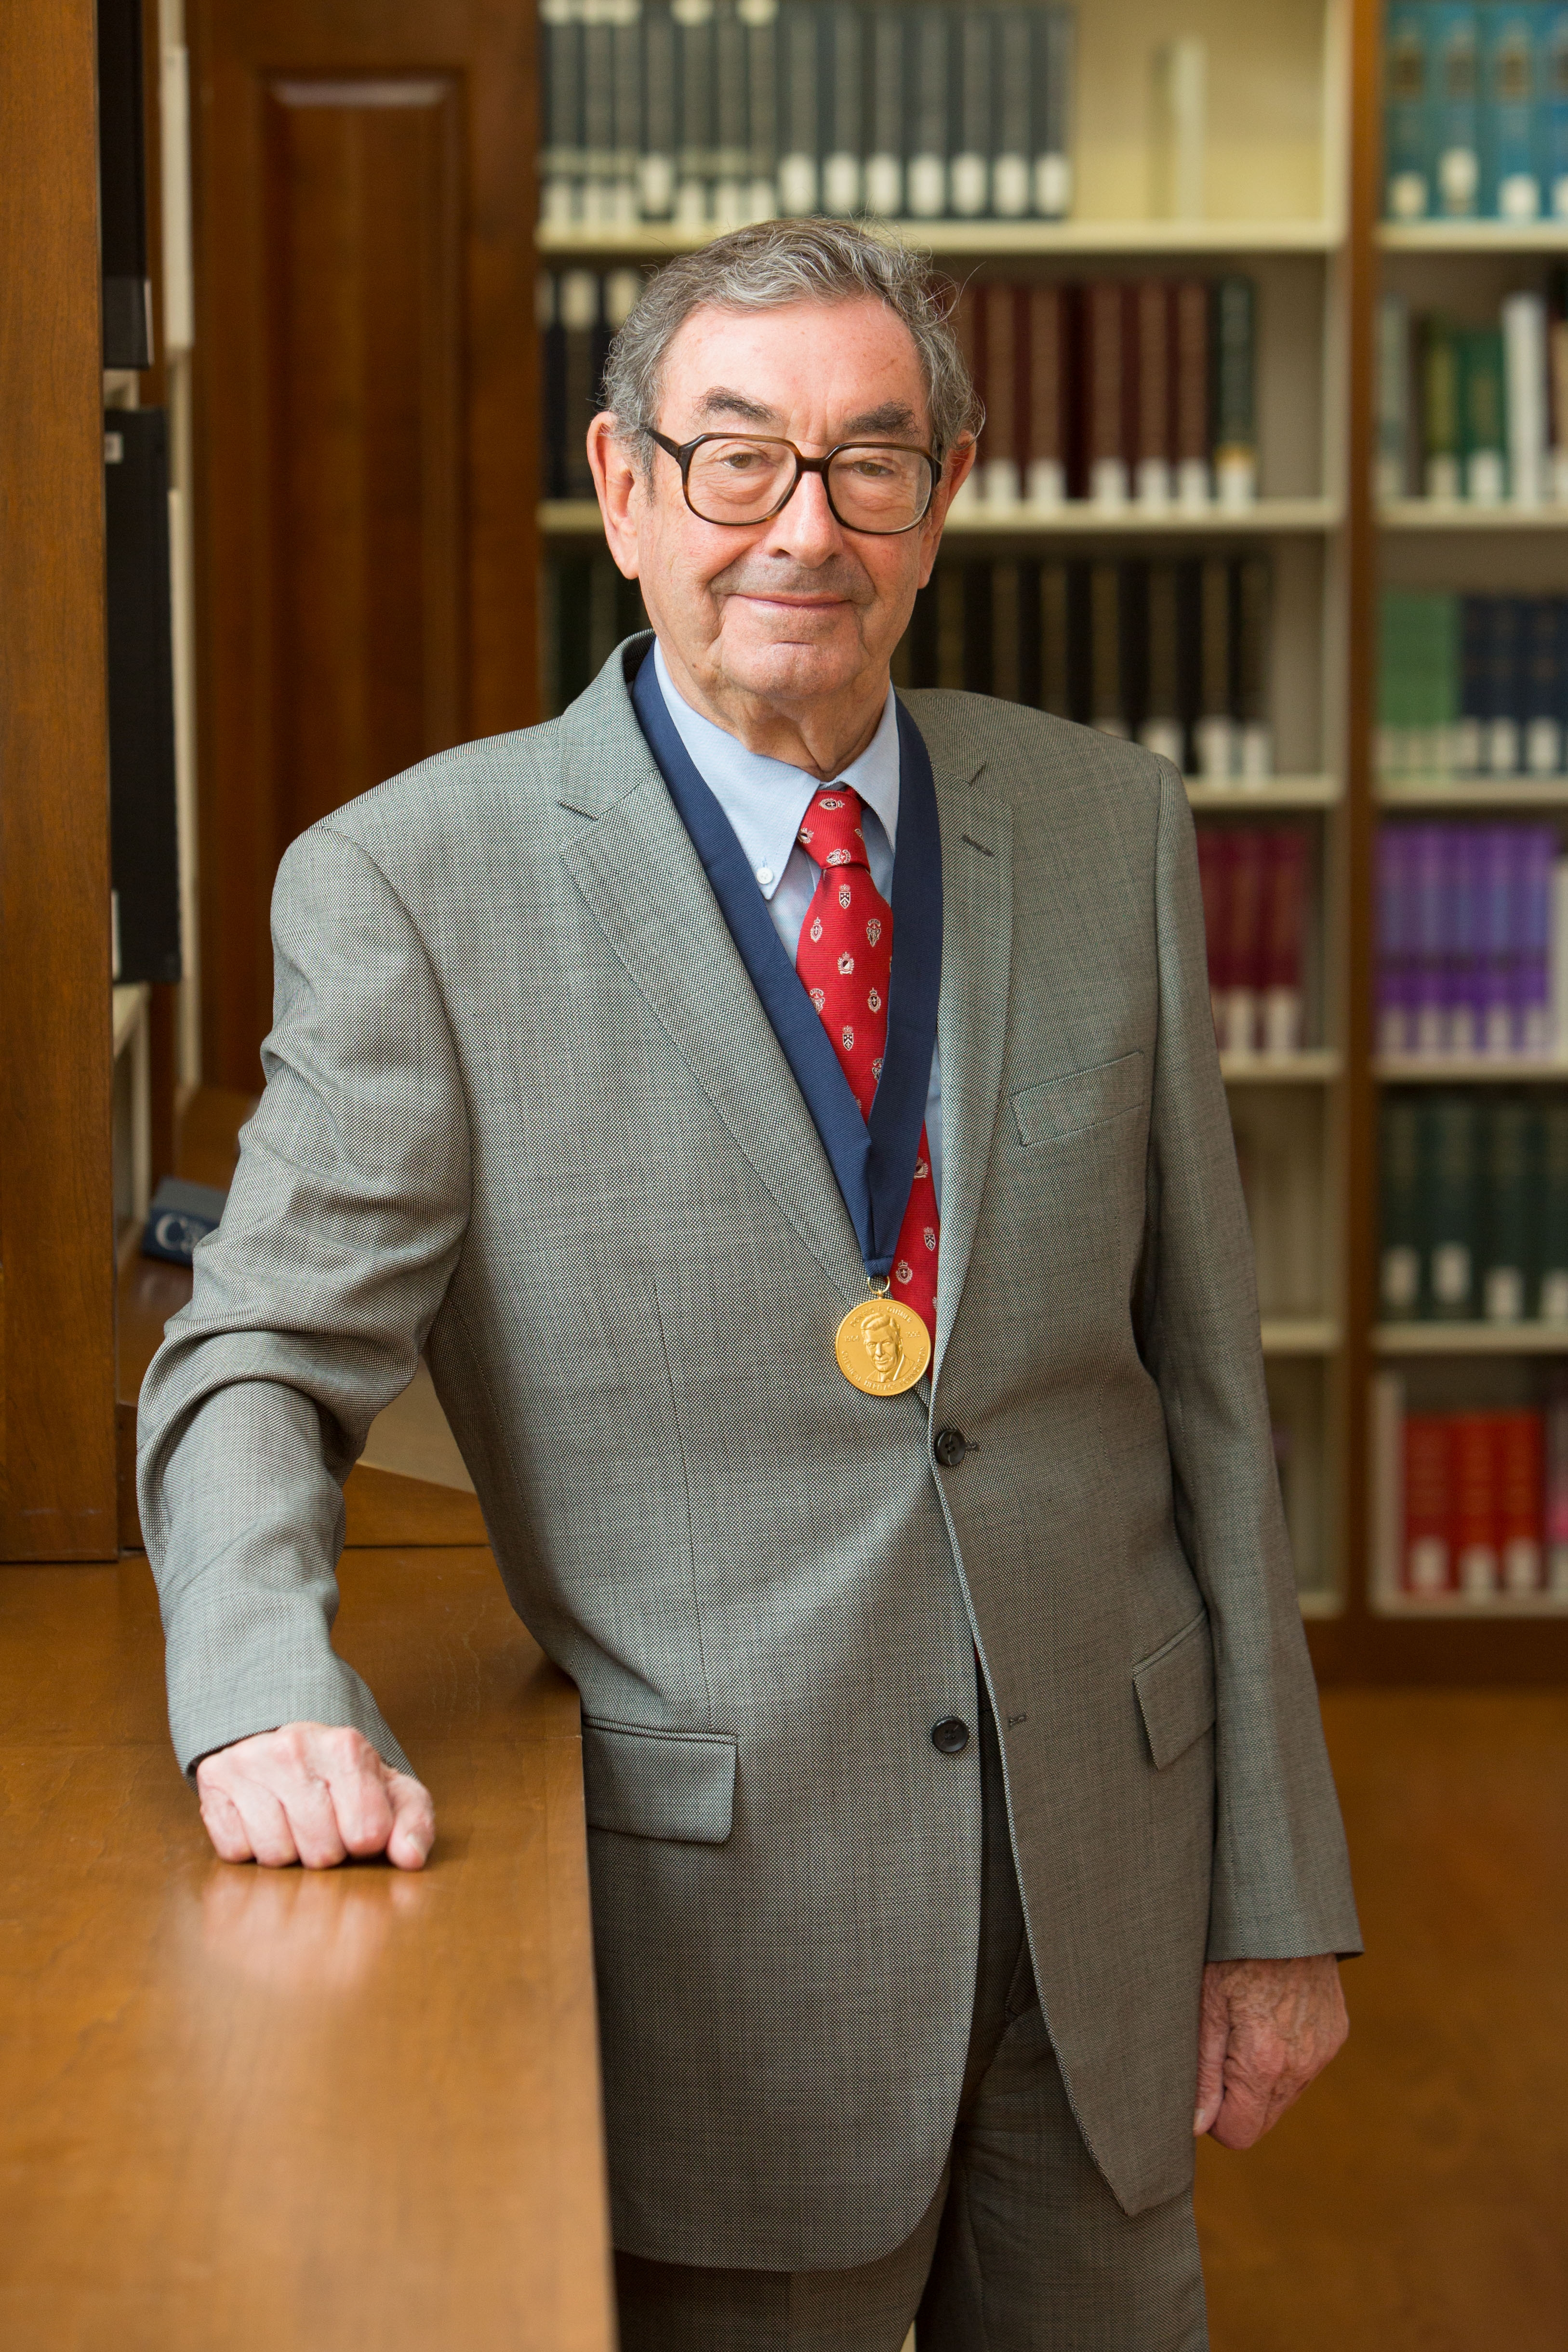 image of Harry B. Gray